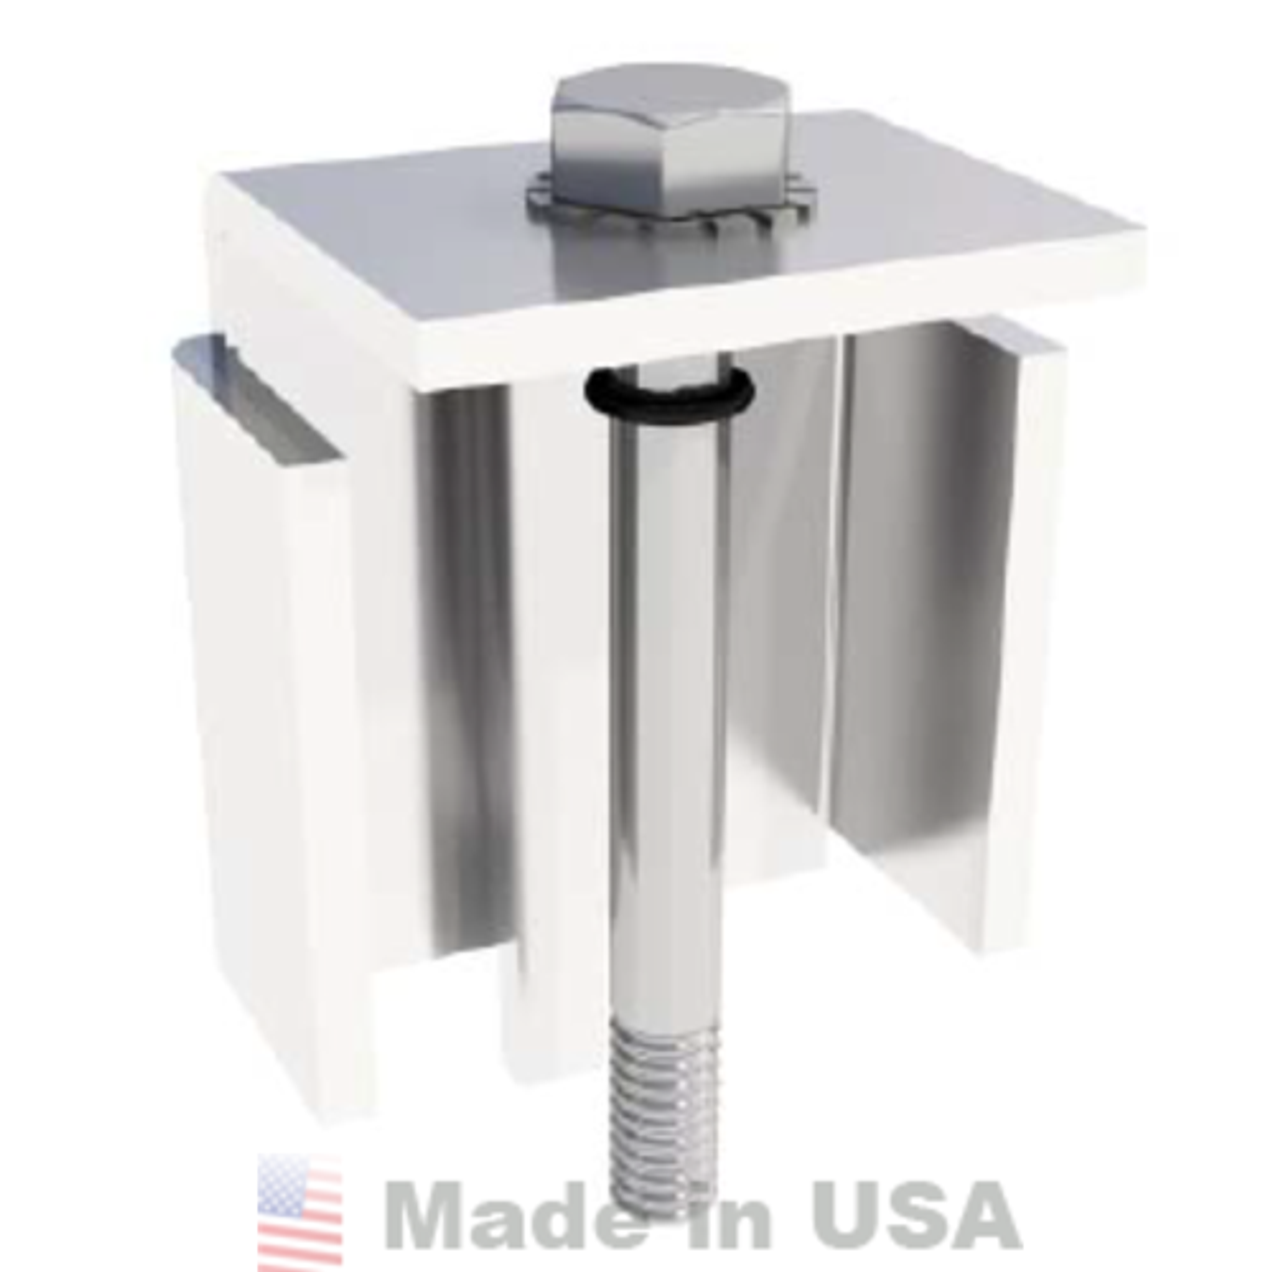 IronRidge BRM Ballast Module Clamp (Fits 32.5mm - 33.4mm)